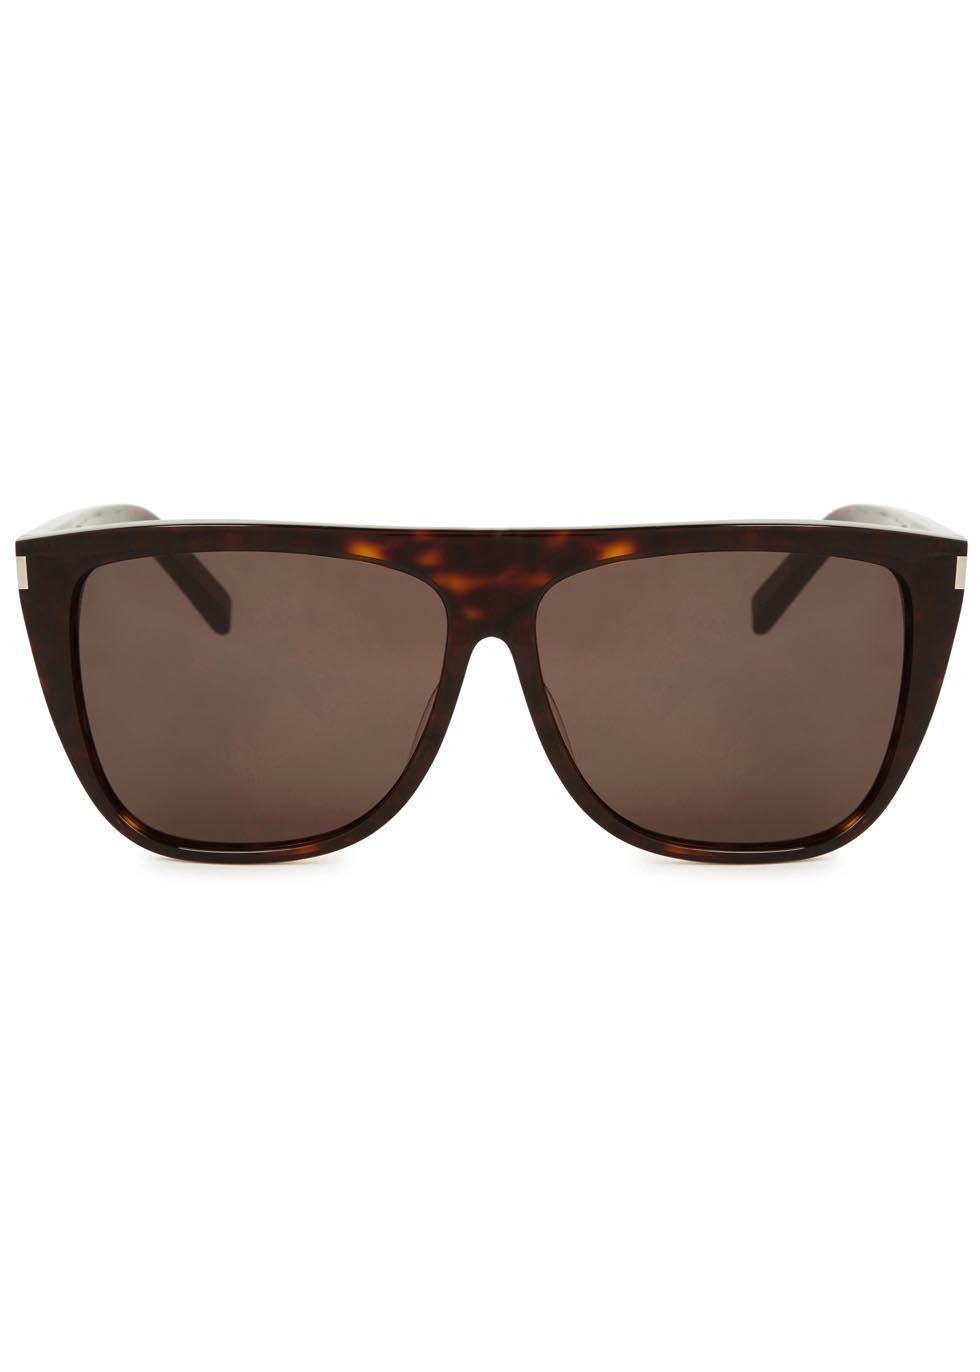 SL 1 tortoiseshell D-frame sunglasses - Saint Laurent